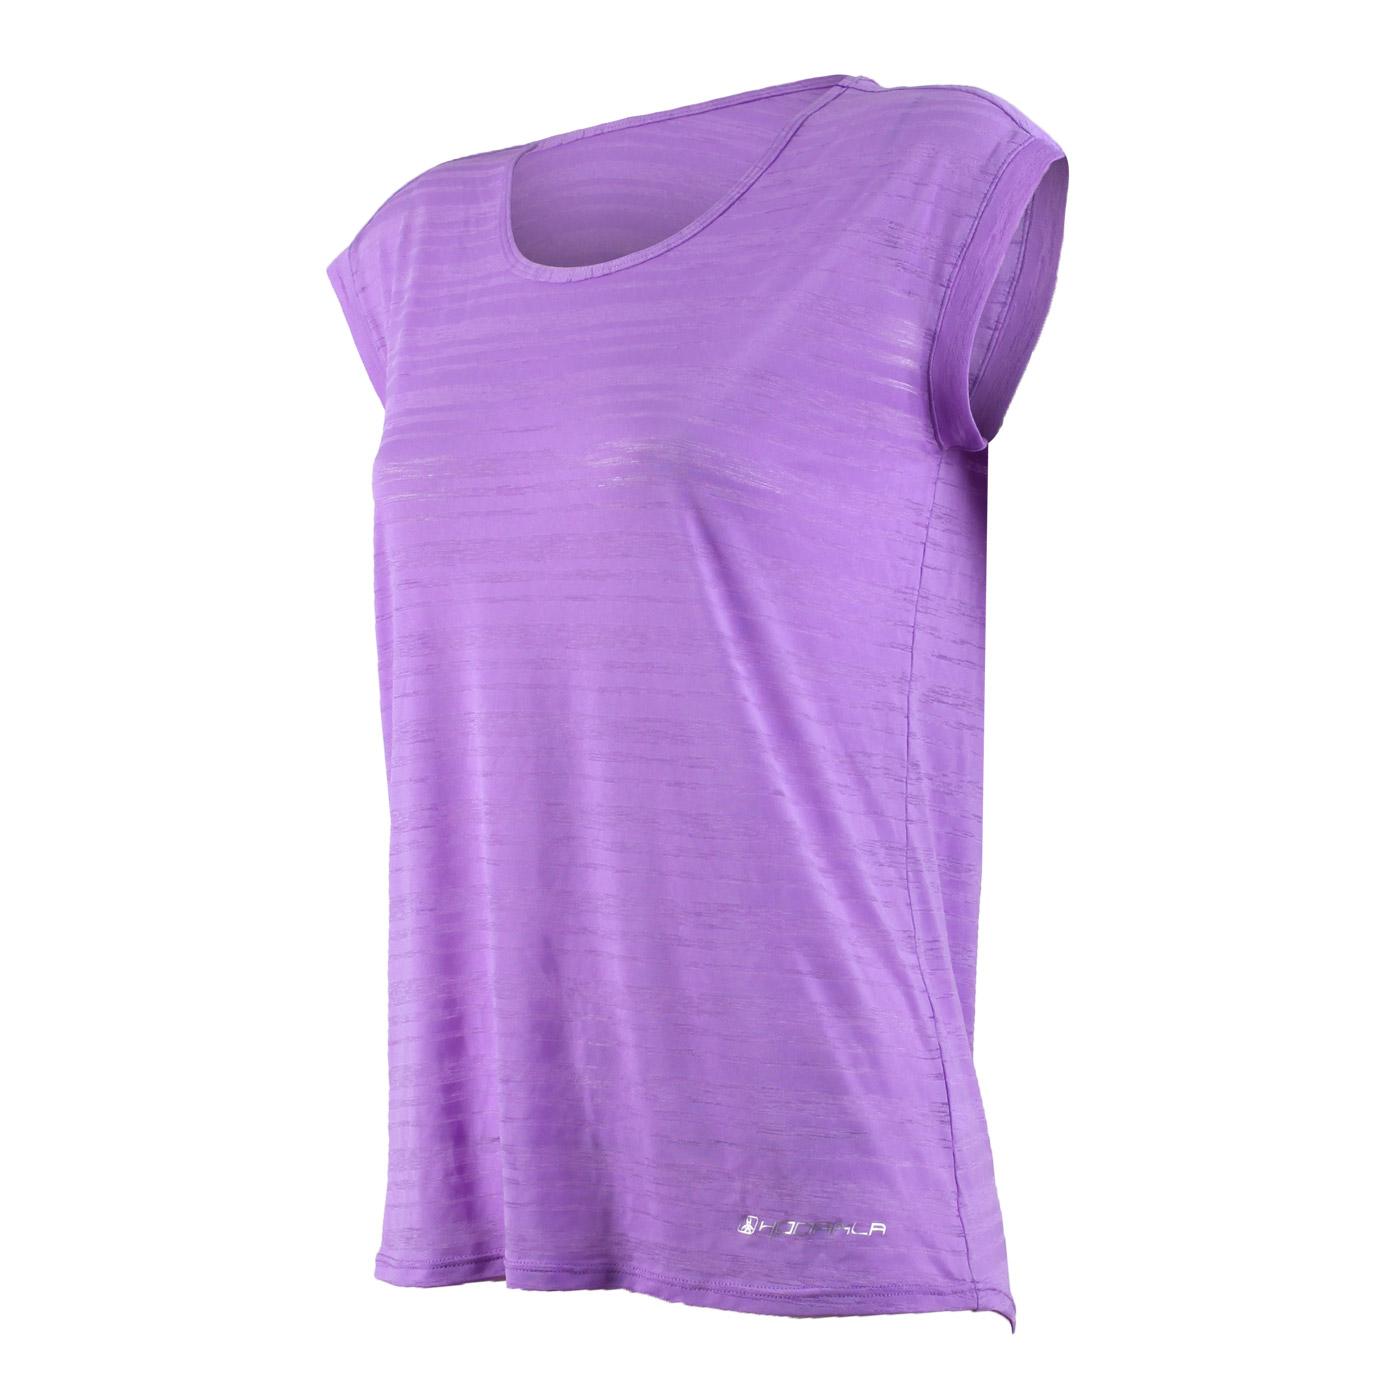 HODARLA 女款輕羽透膚短袖T恤 3126701 - 紫